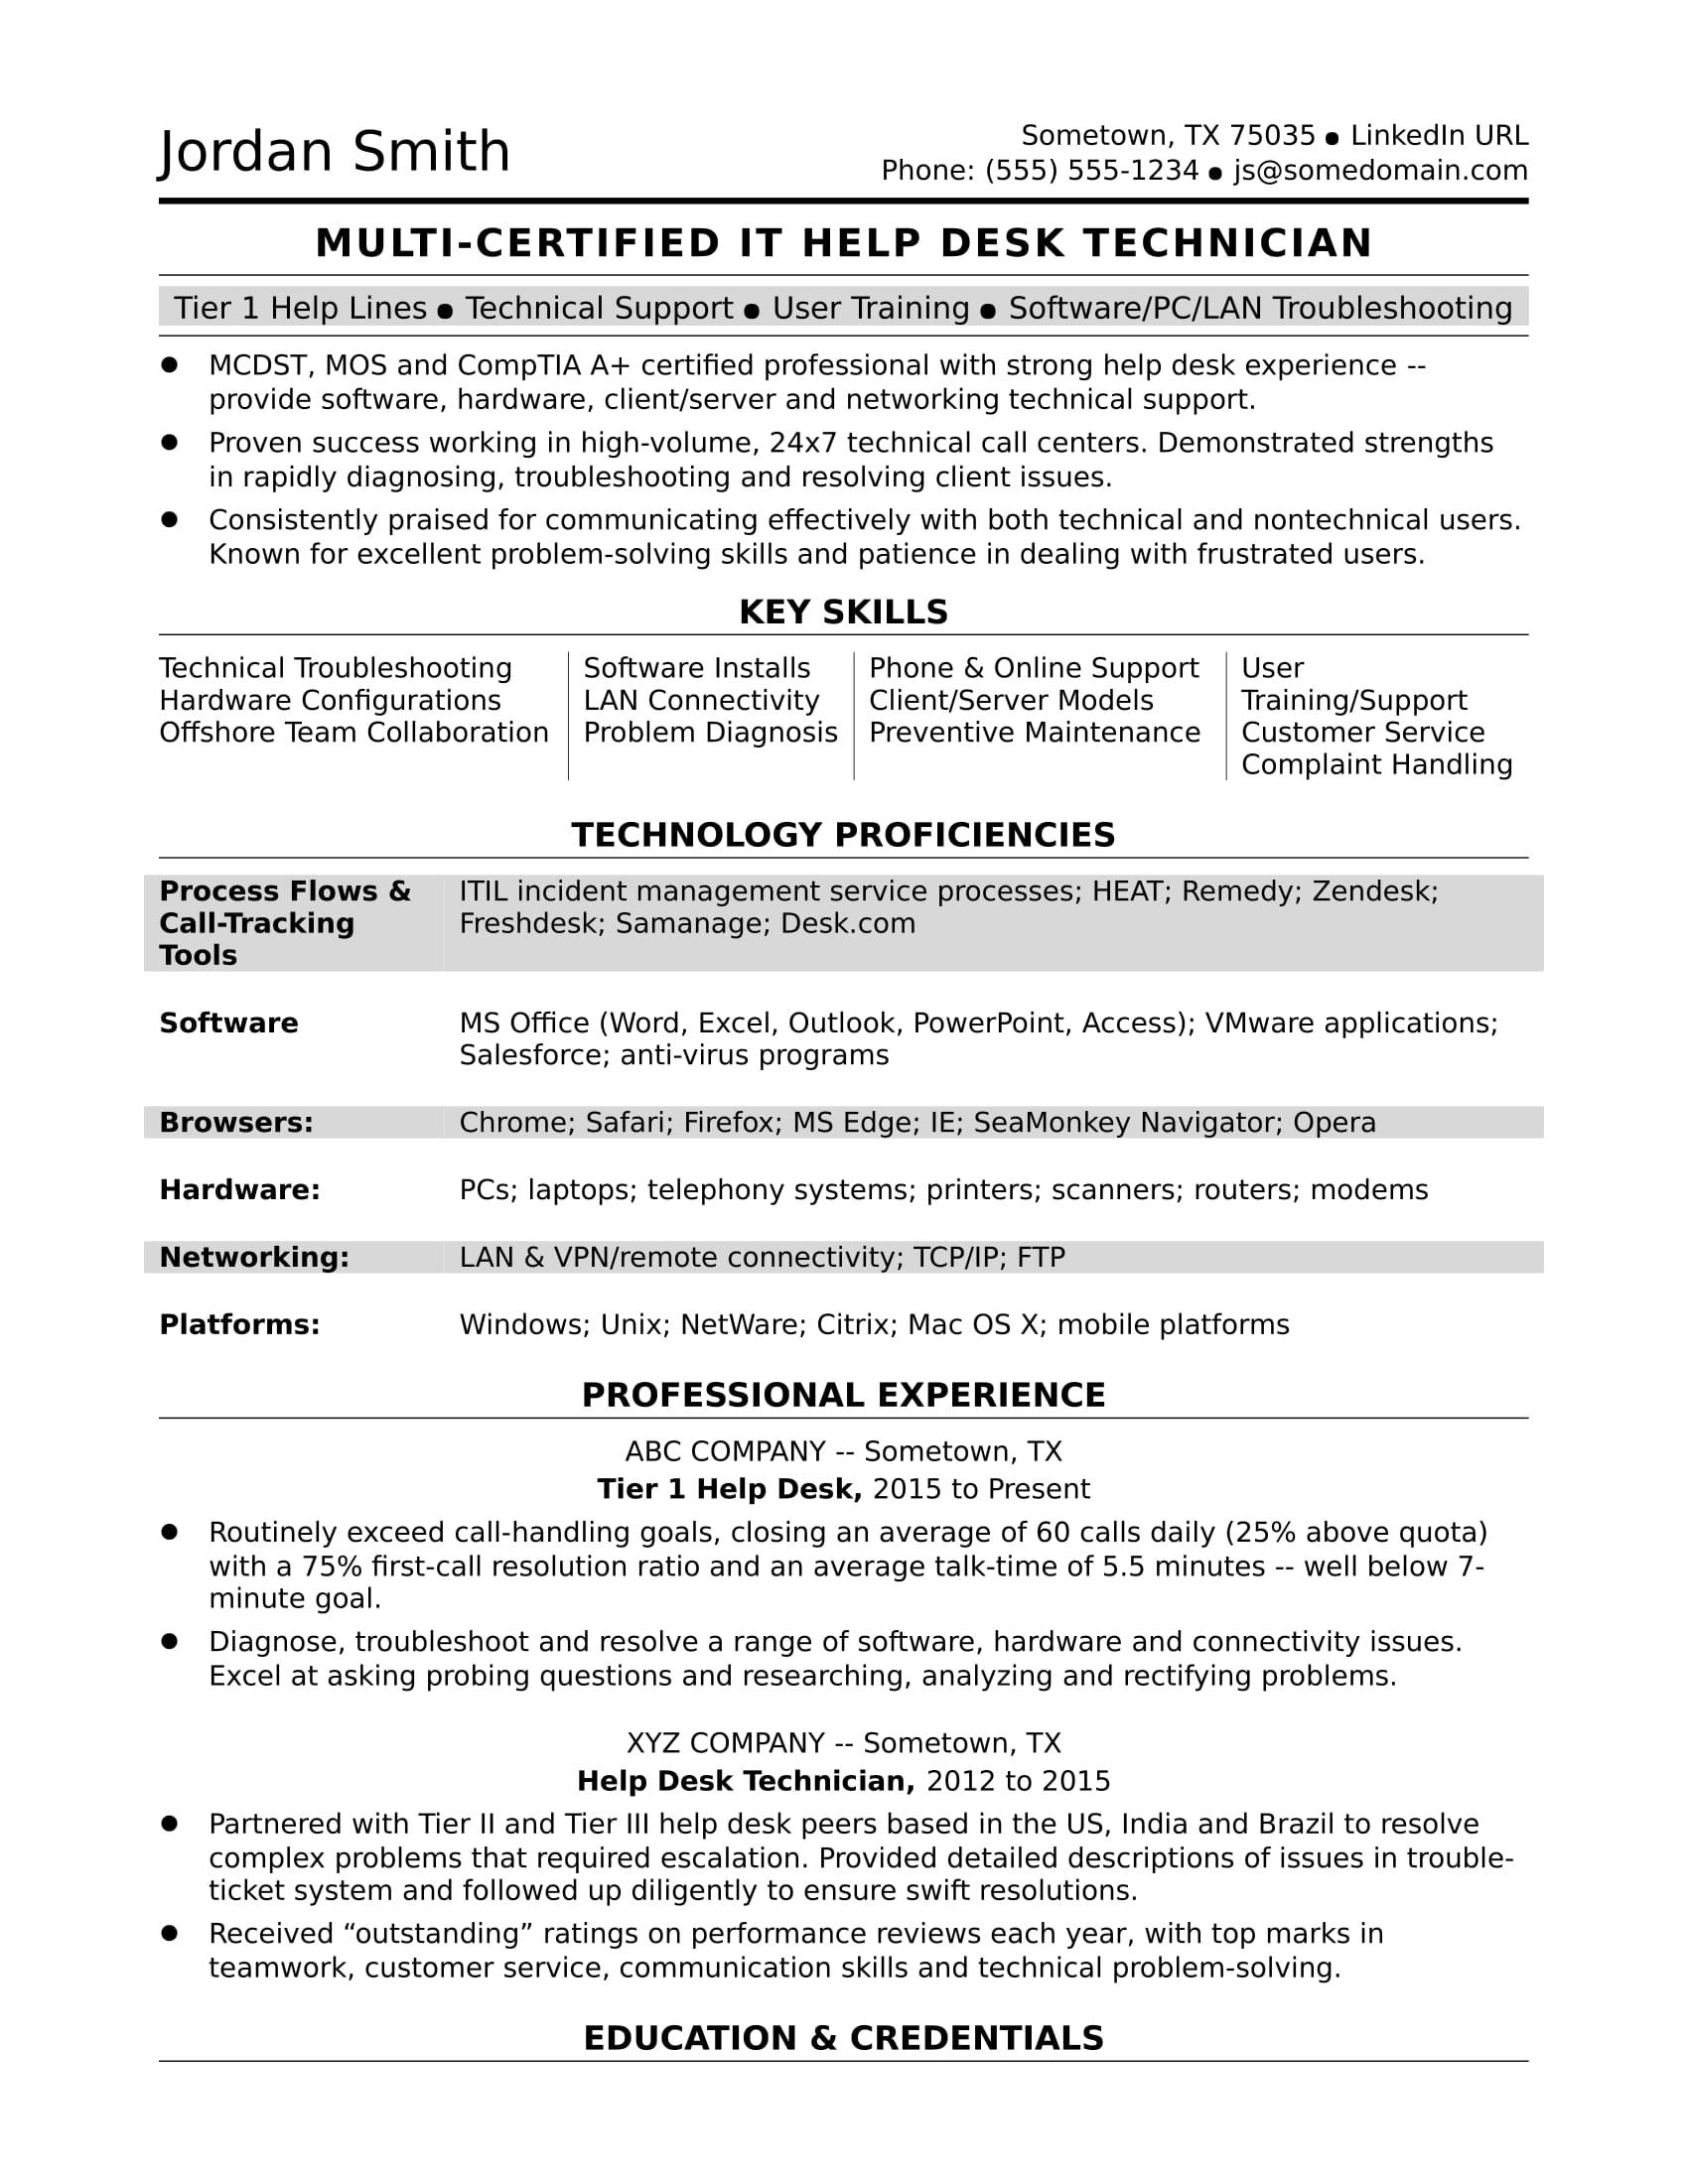 Sample Resume For A Midlevel It Help Desk Professional